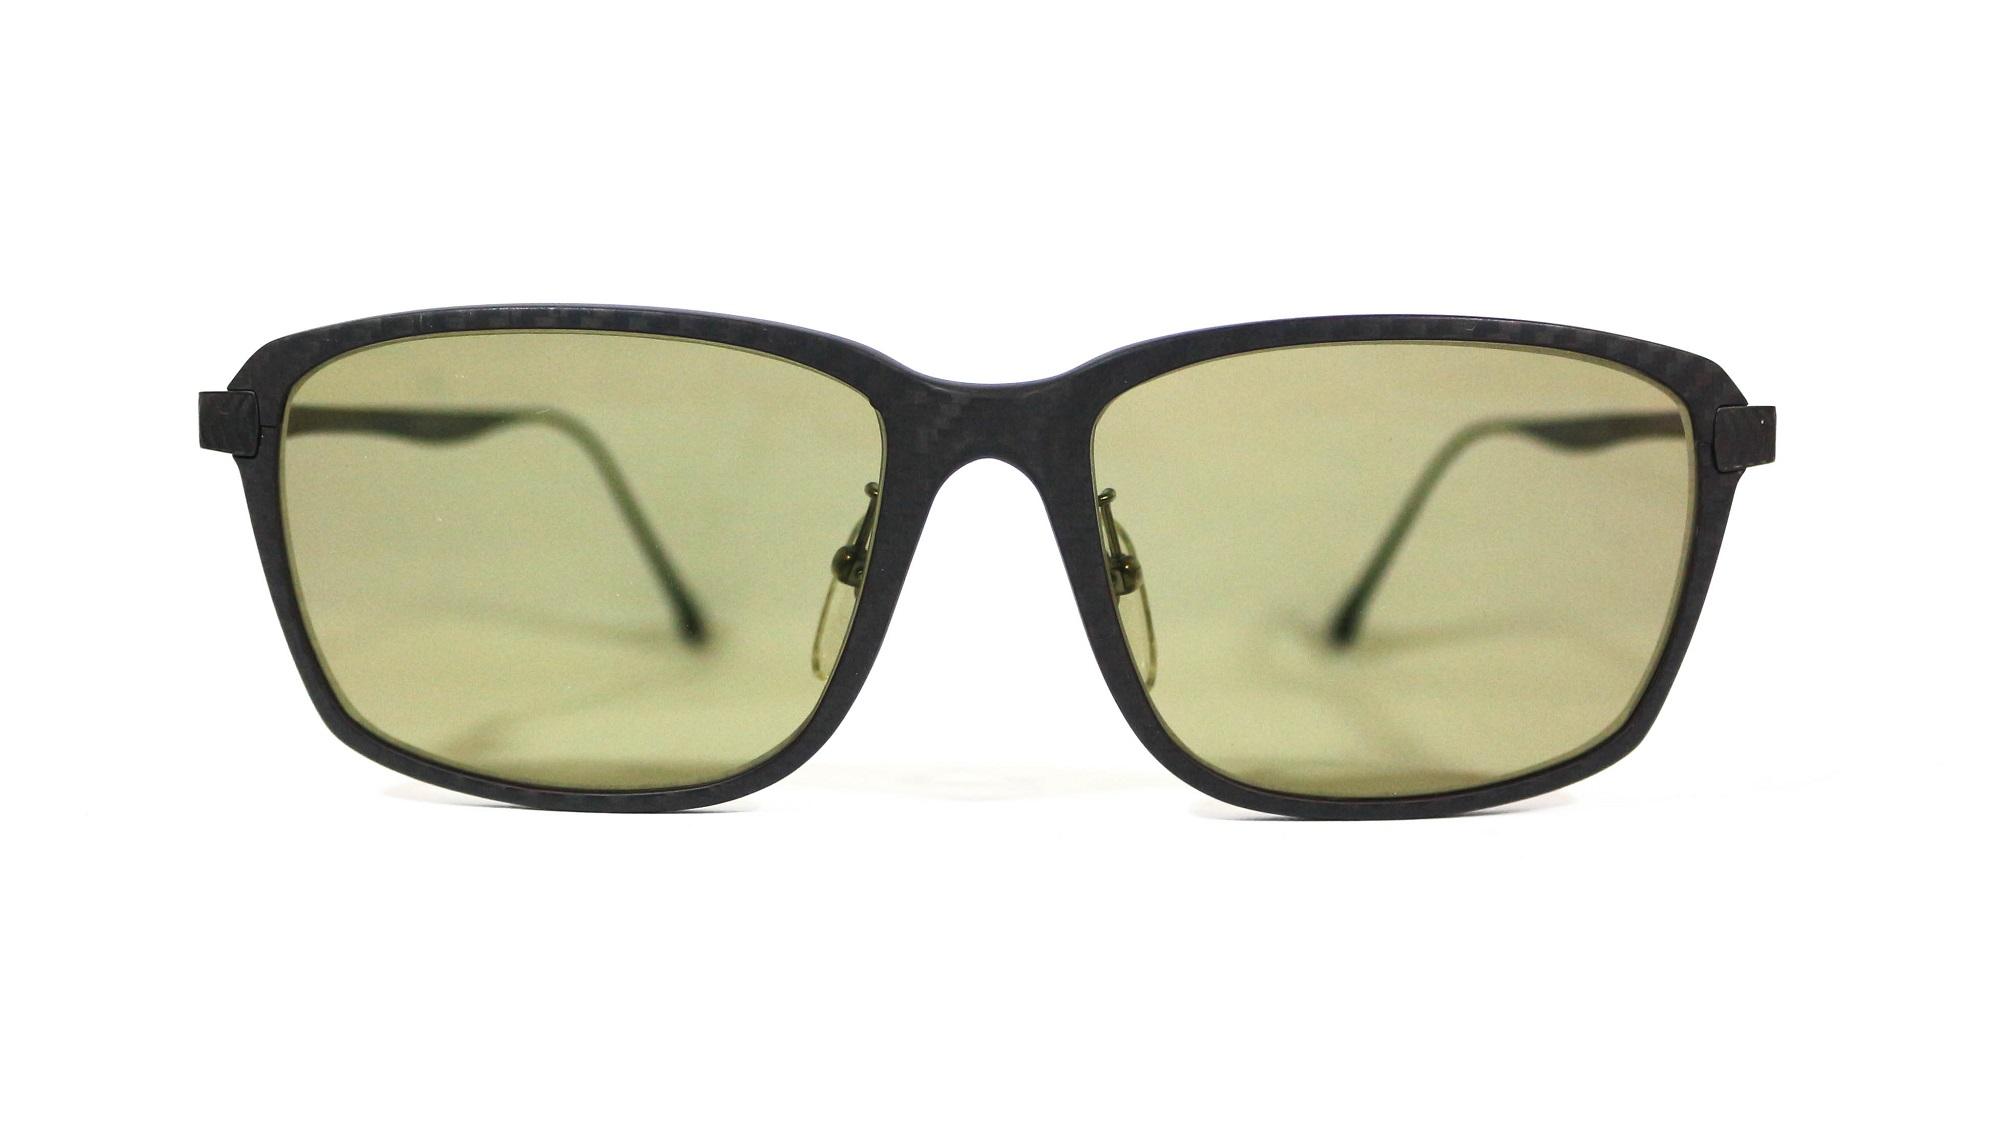 Zeque Polarised Fishing Sunglasses Jet F-1787 True View Sports (7563)